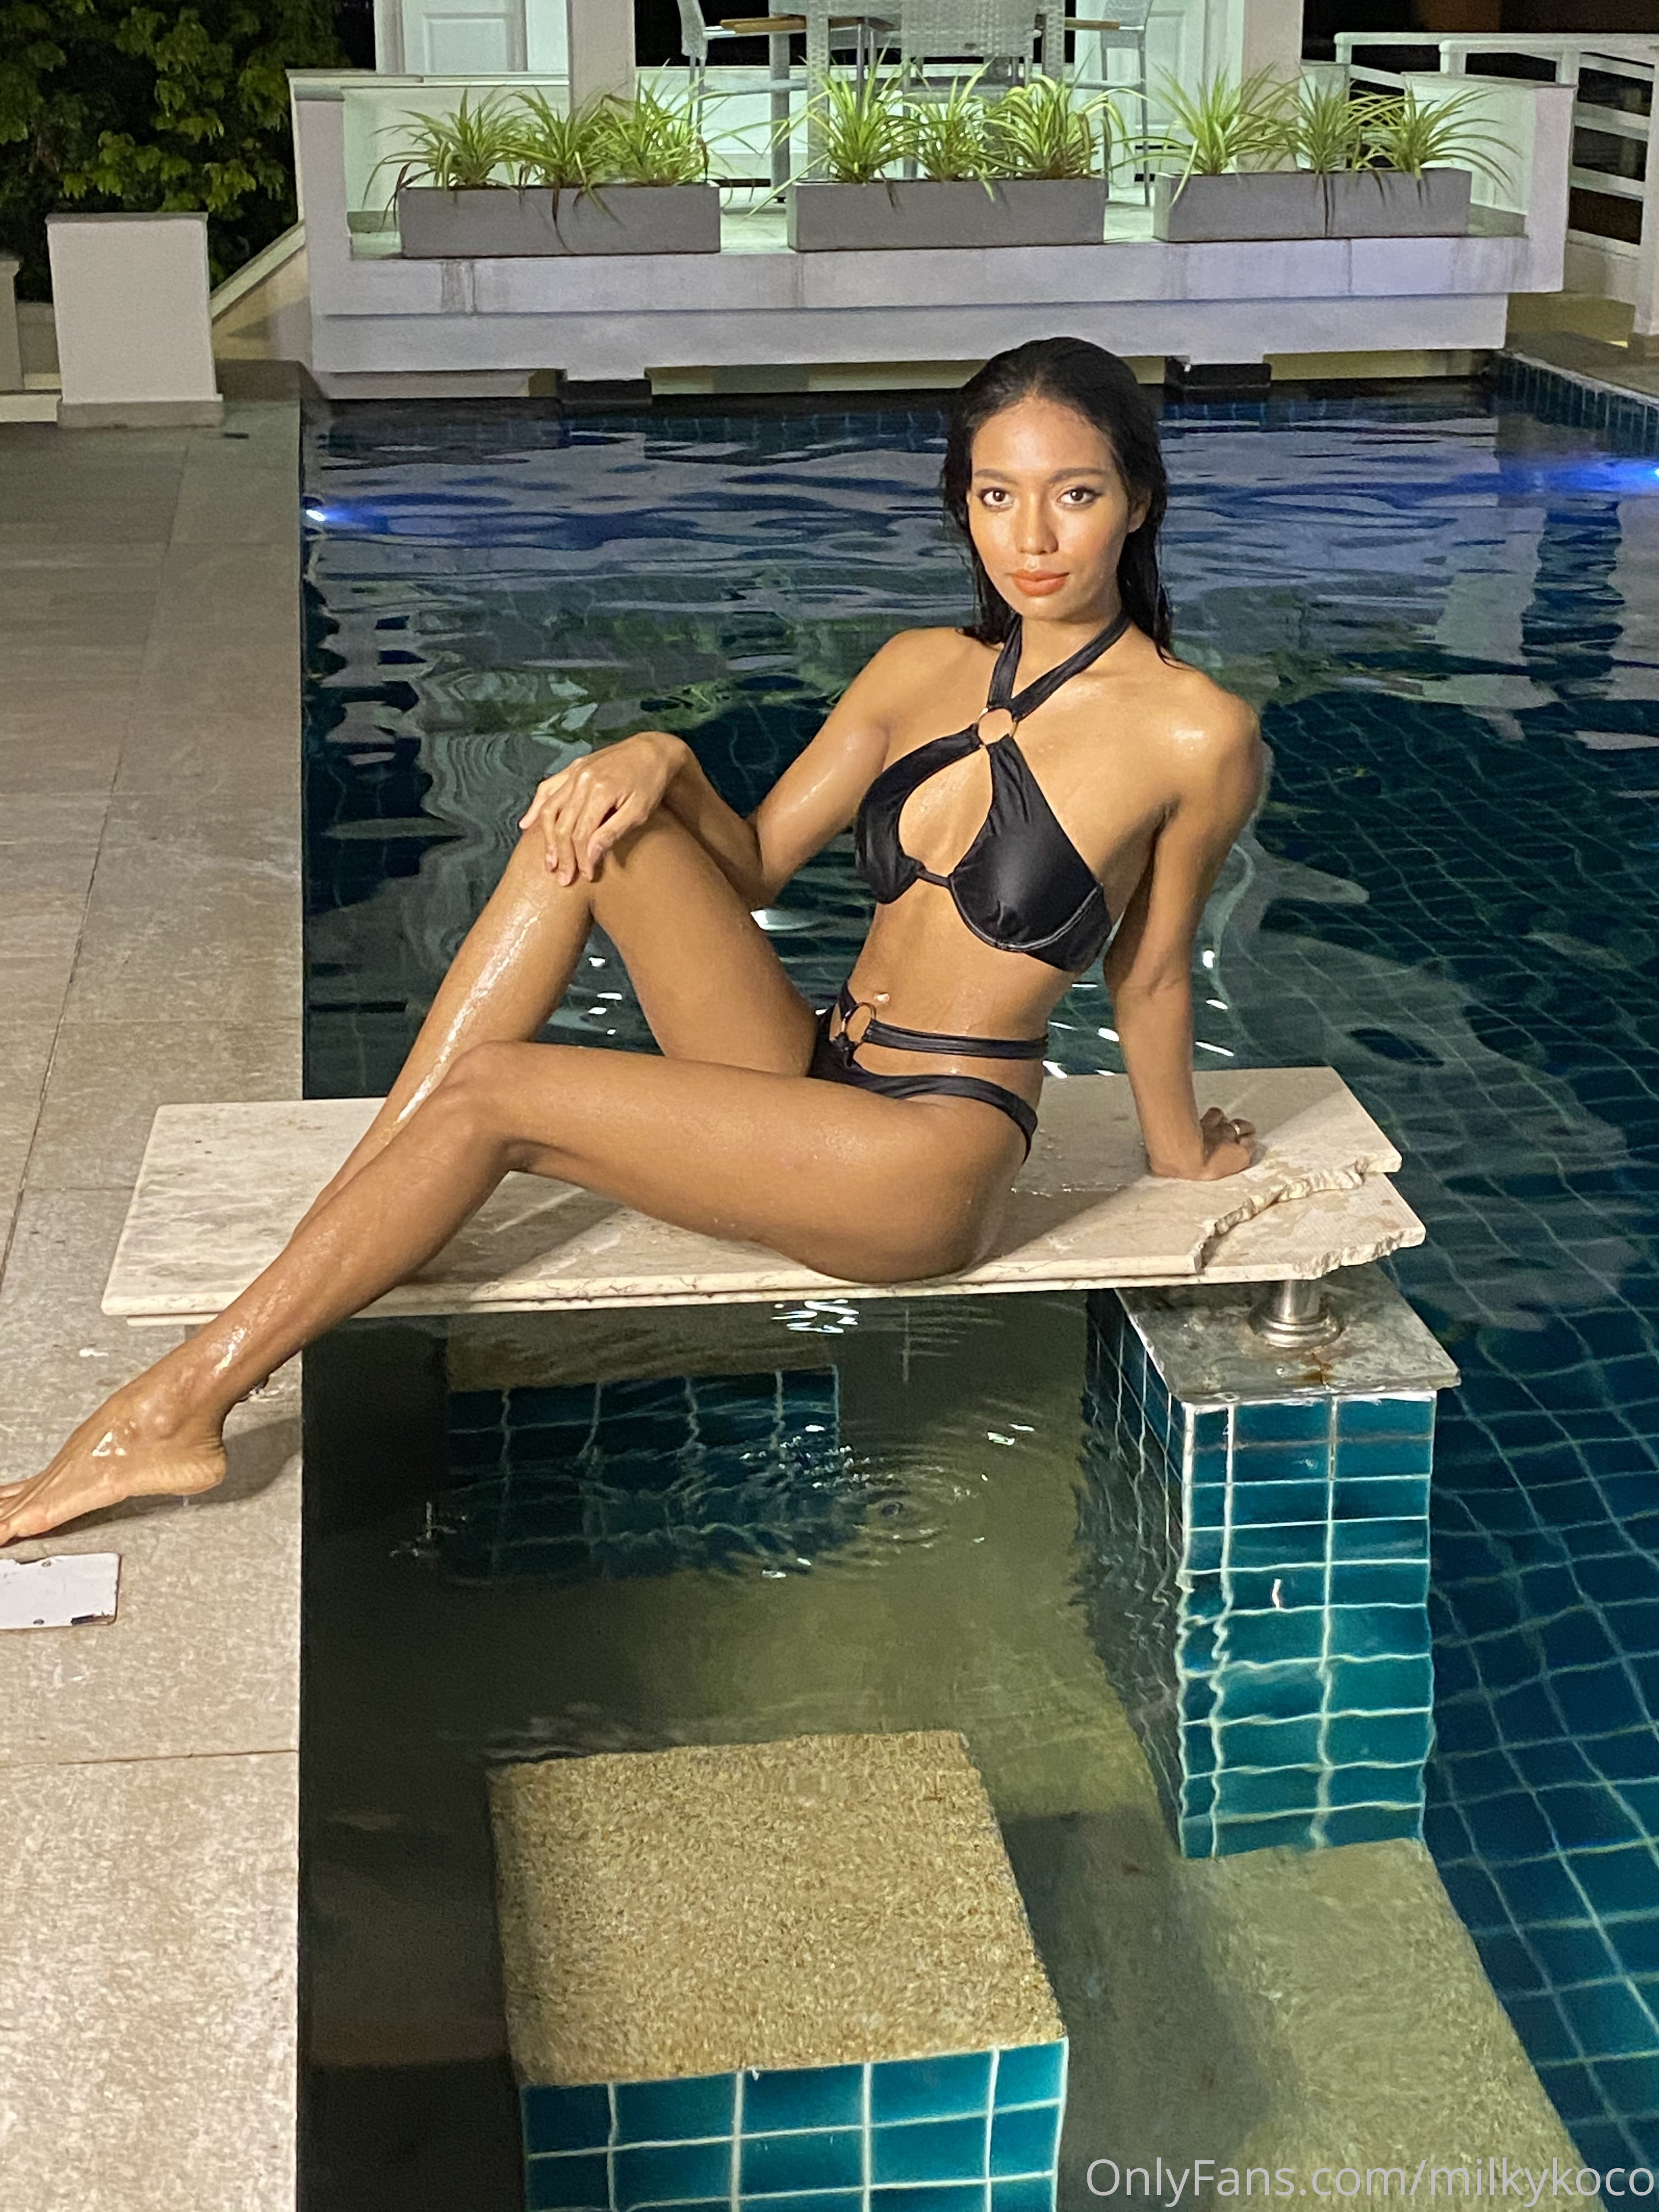 Koko Mylk Bangkok Model Leaked Onlyfans 0086